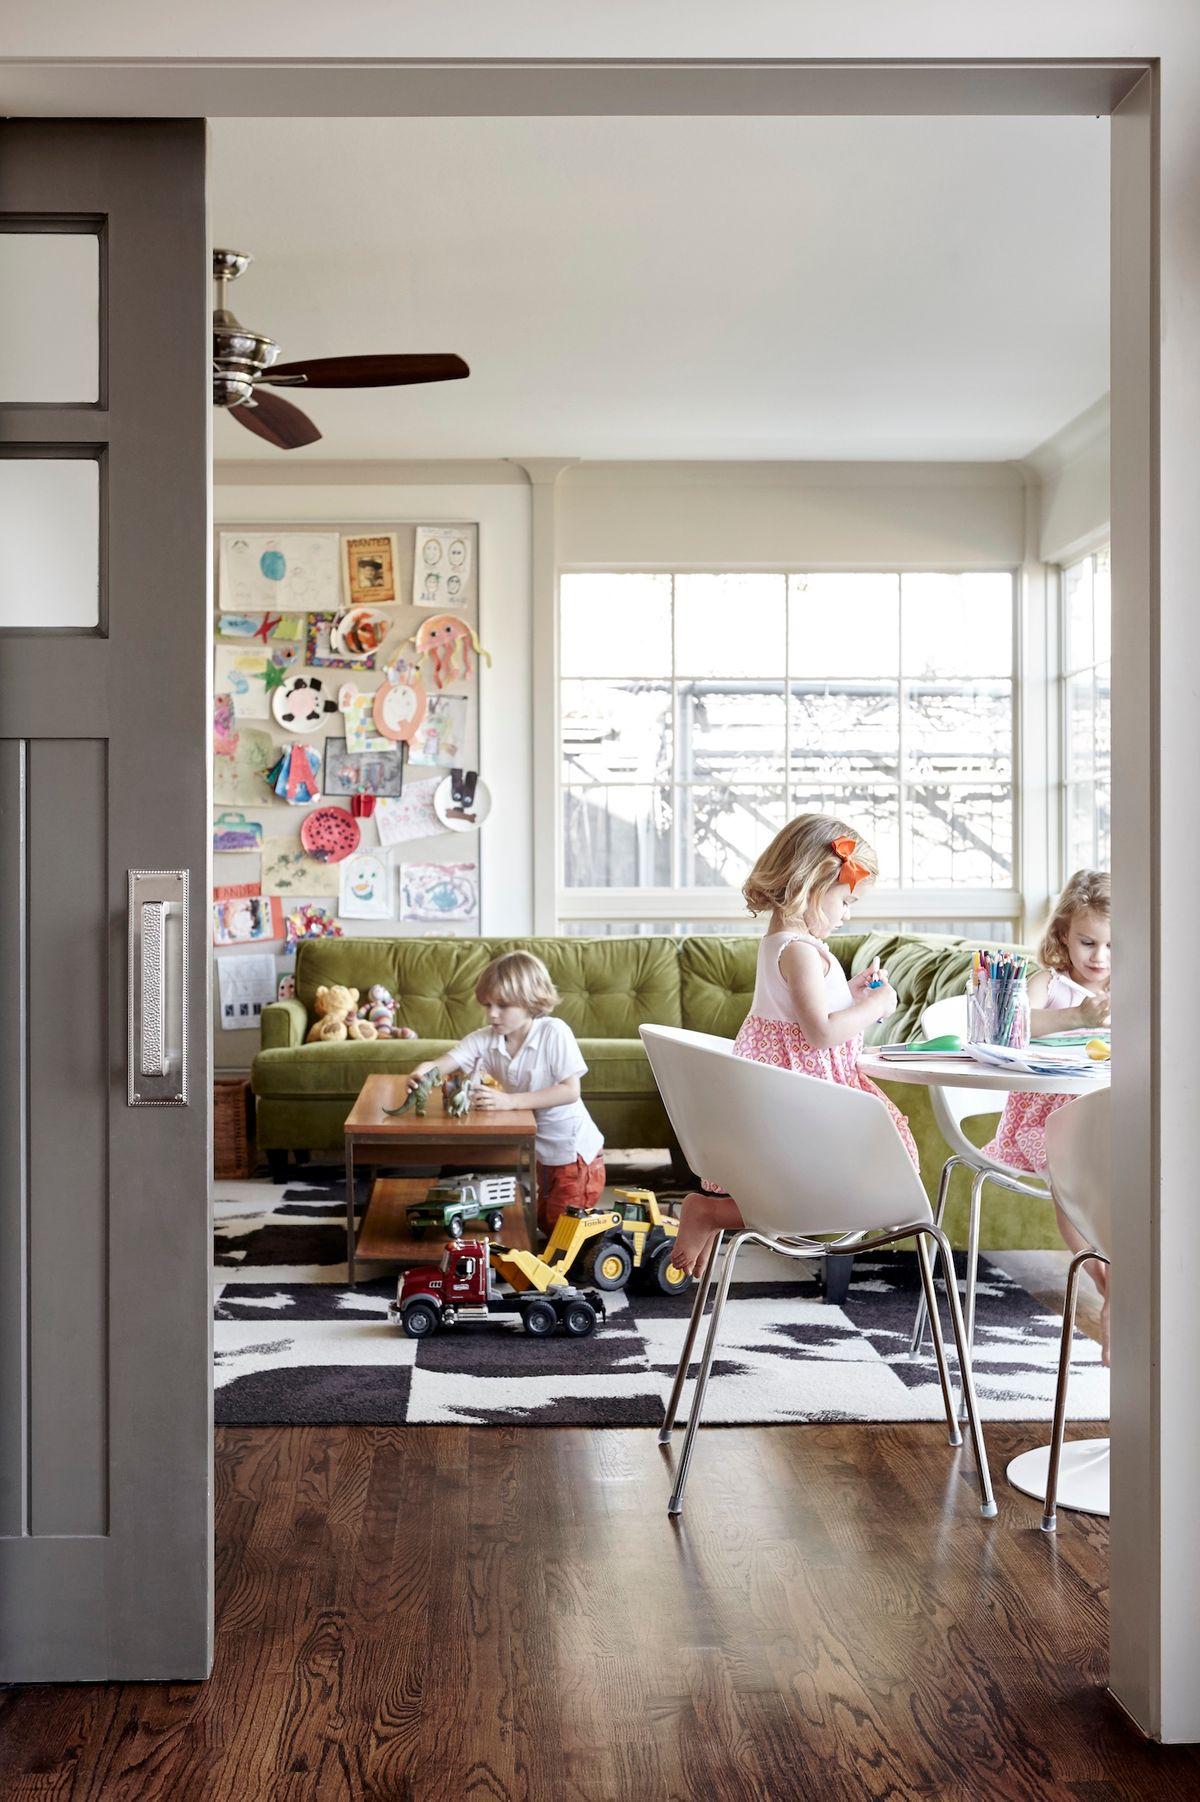 Pär Bengtsson Home Interior Editorial Photography3.jpeg